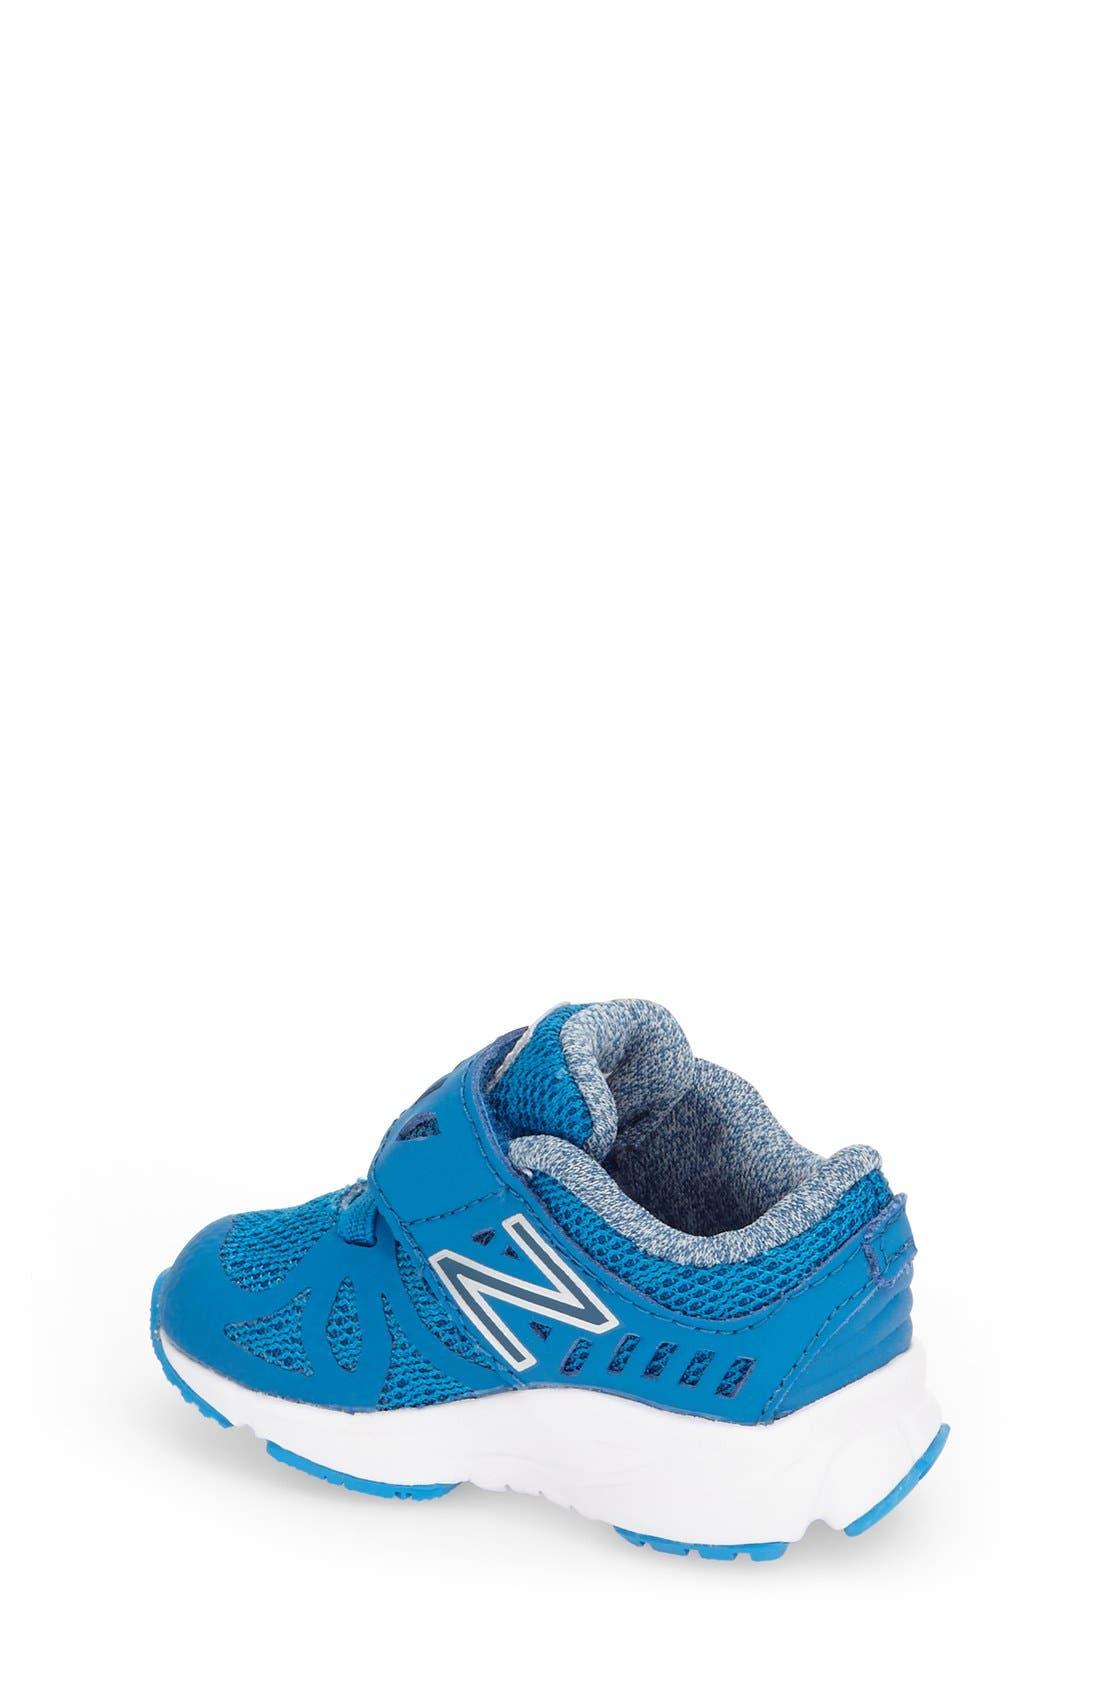 'Vazee Rush 200' Athletic Shoe,                             Alternate thumbnail 11, color,